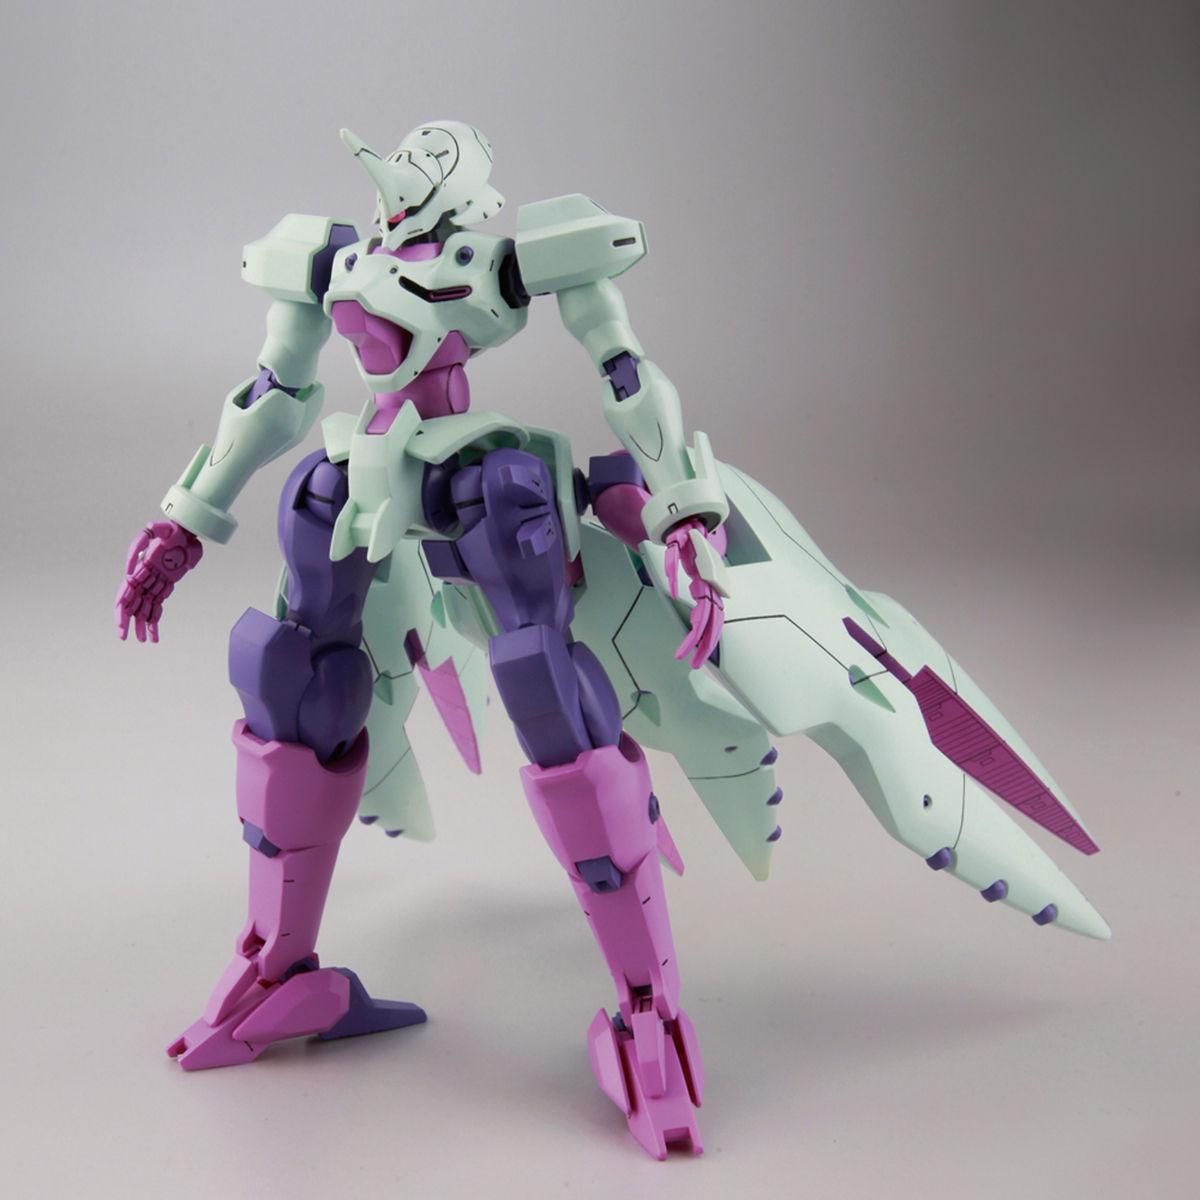 3181HG 1/144 VGMM-Gf10 ガンダム G-ルシファー [Gundam G-Lucifer]